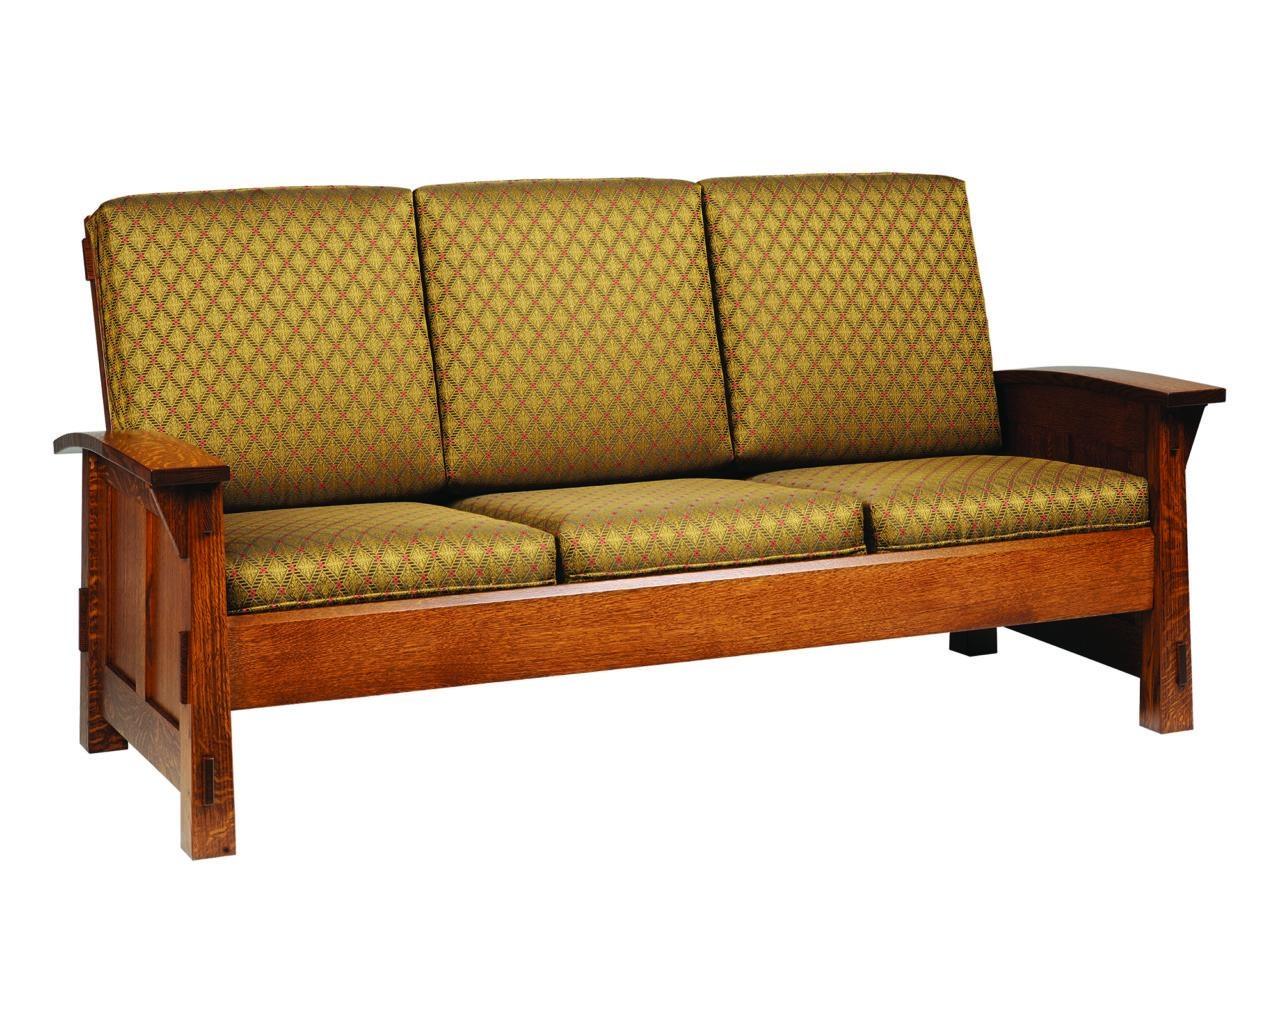 Olde Shaker Sofa – Gish's Amish Legacies Regarding Shaker Sofas (Image 8 of 20)